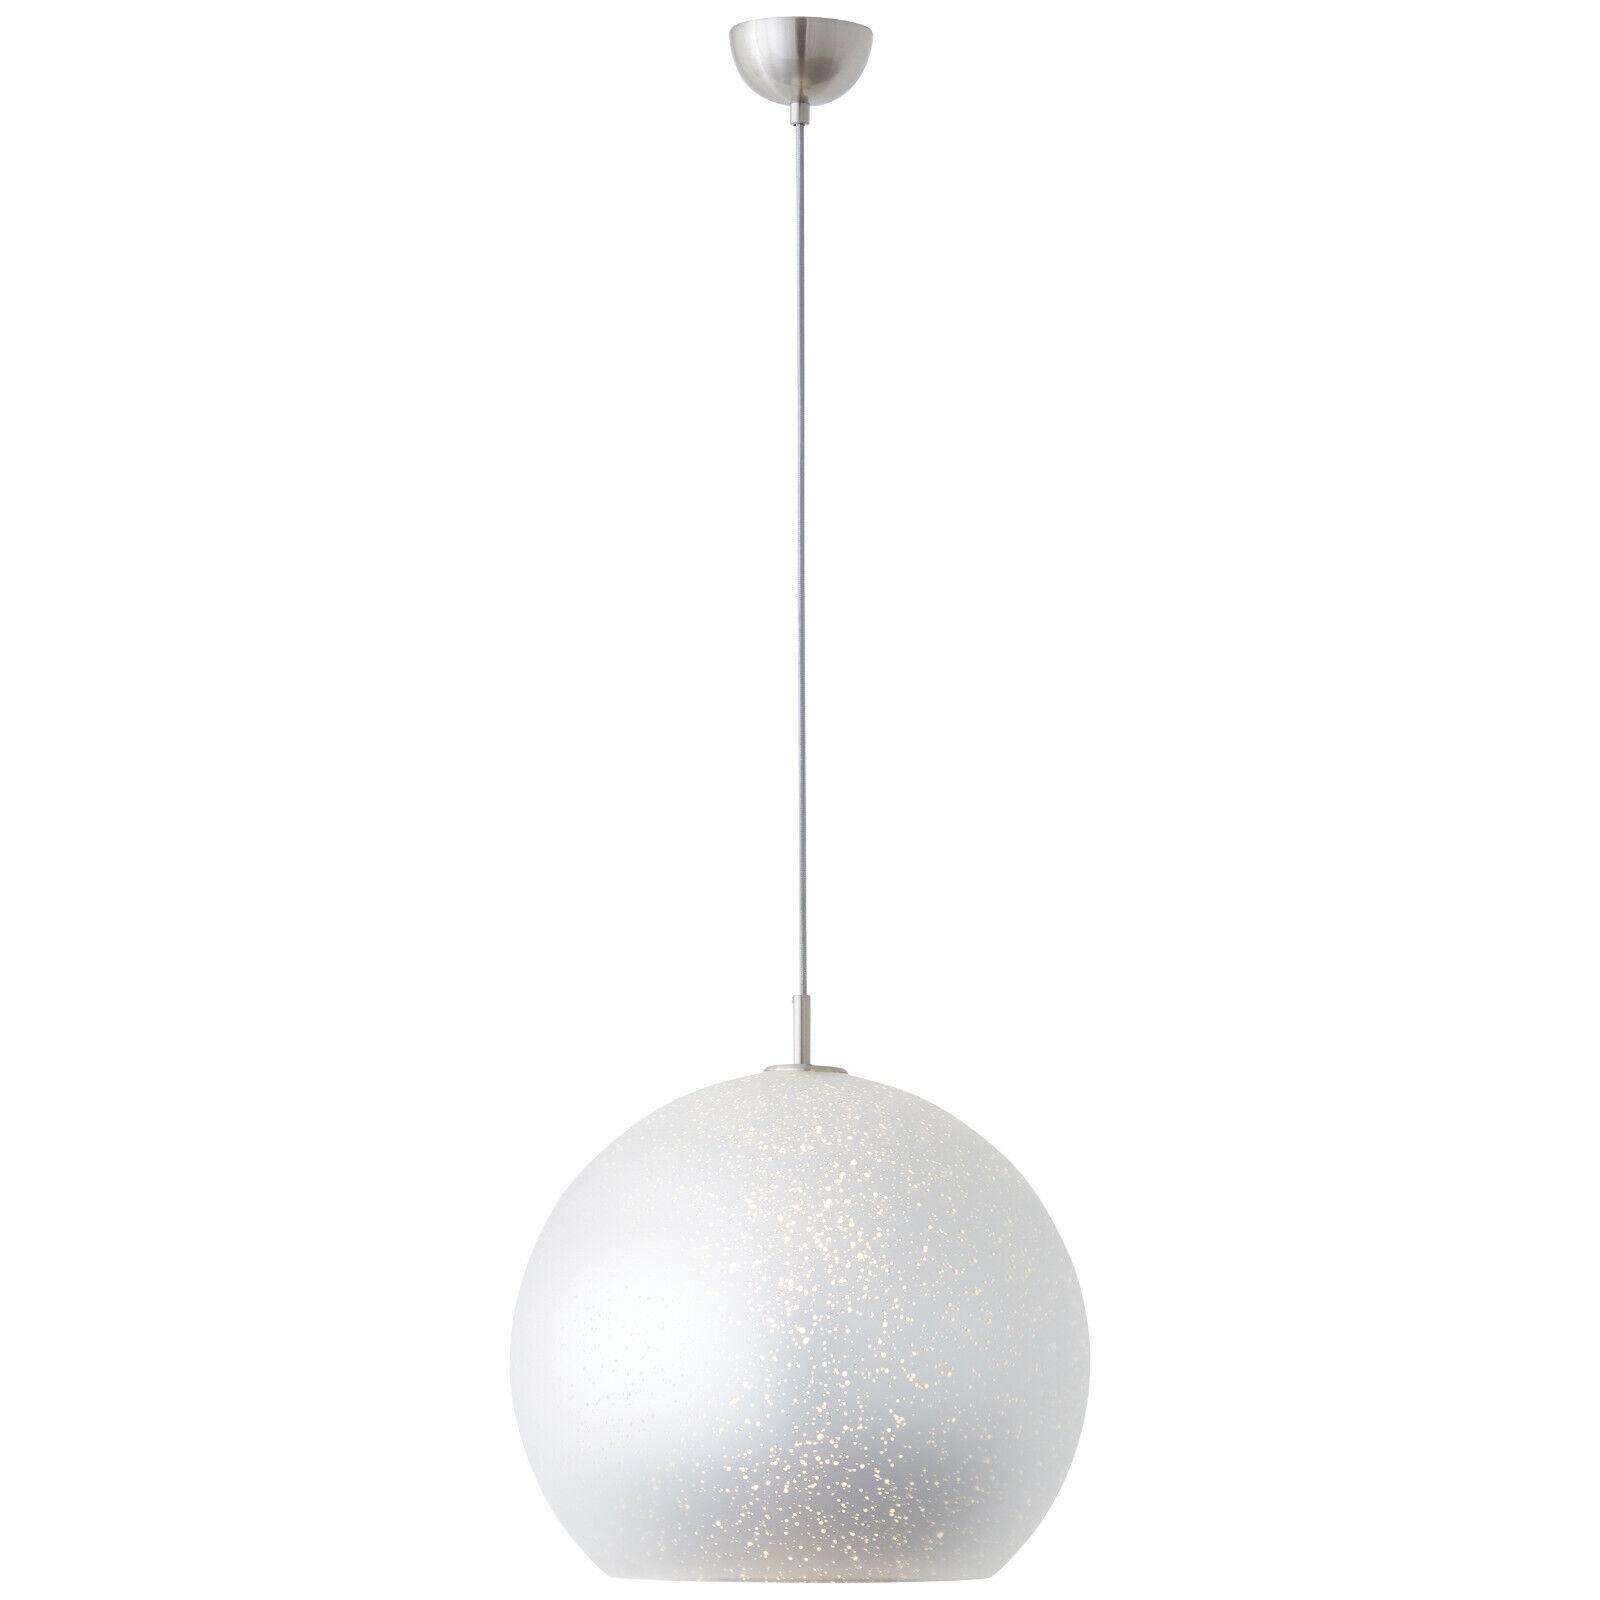 LED Design Hänge Lampen Wohn Schlaf Ess Raum Beleuchtung Pendel Leuchten silbern